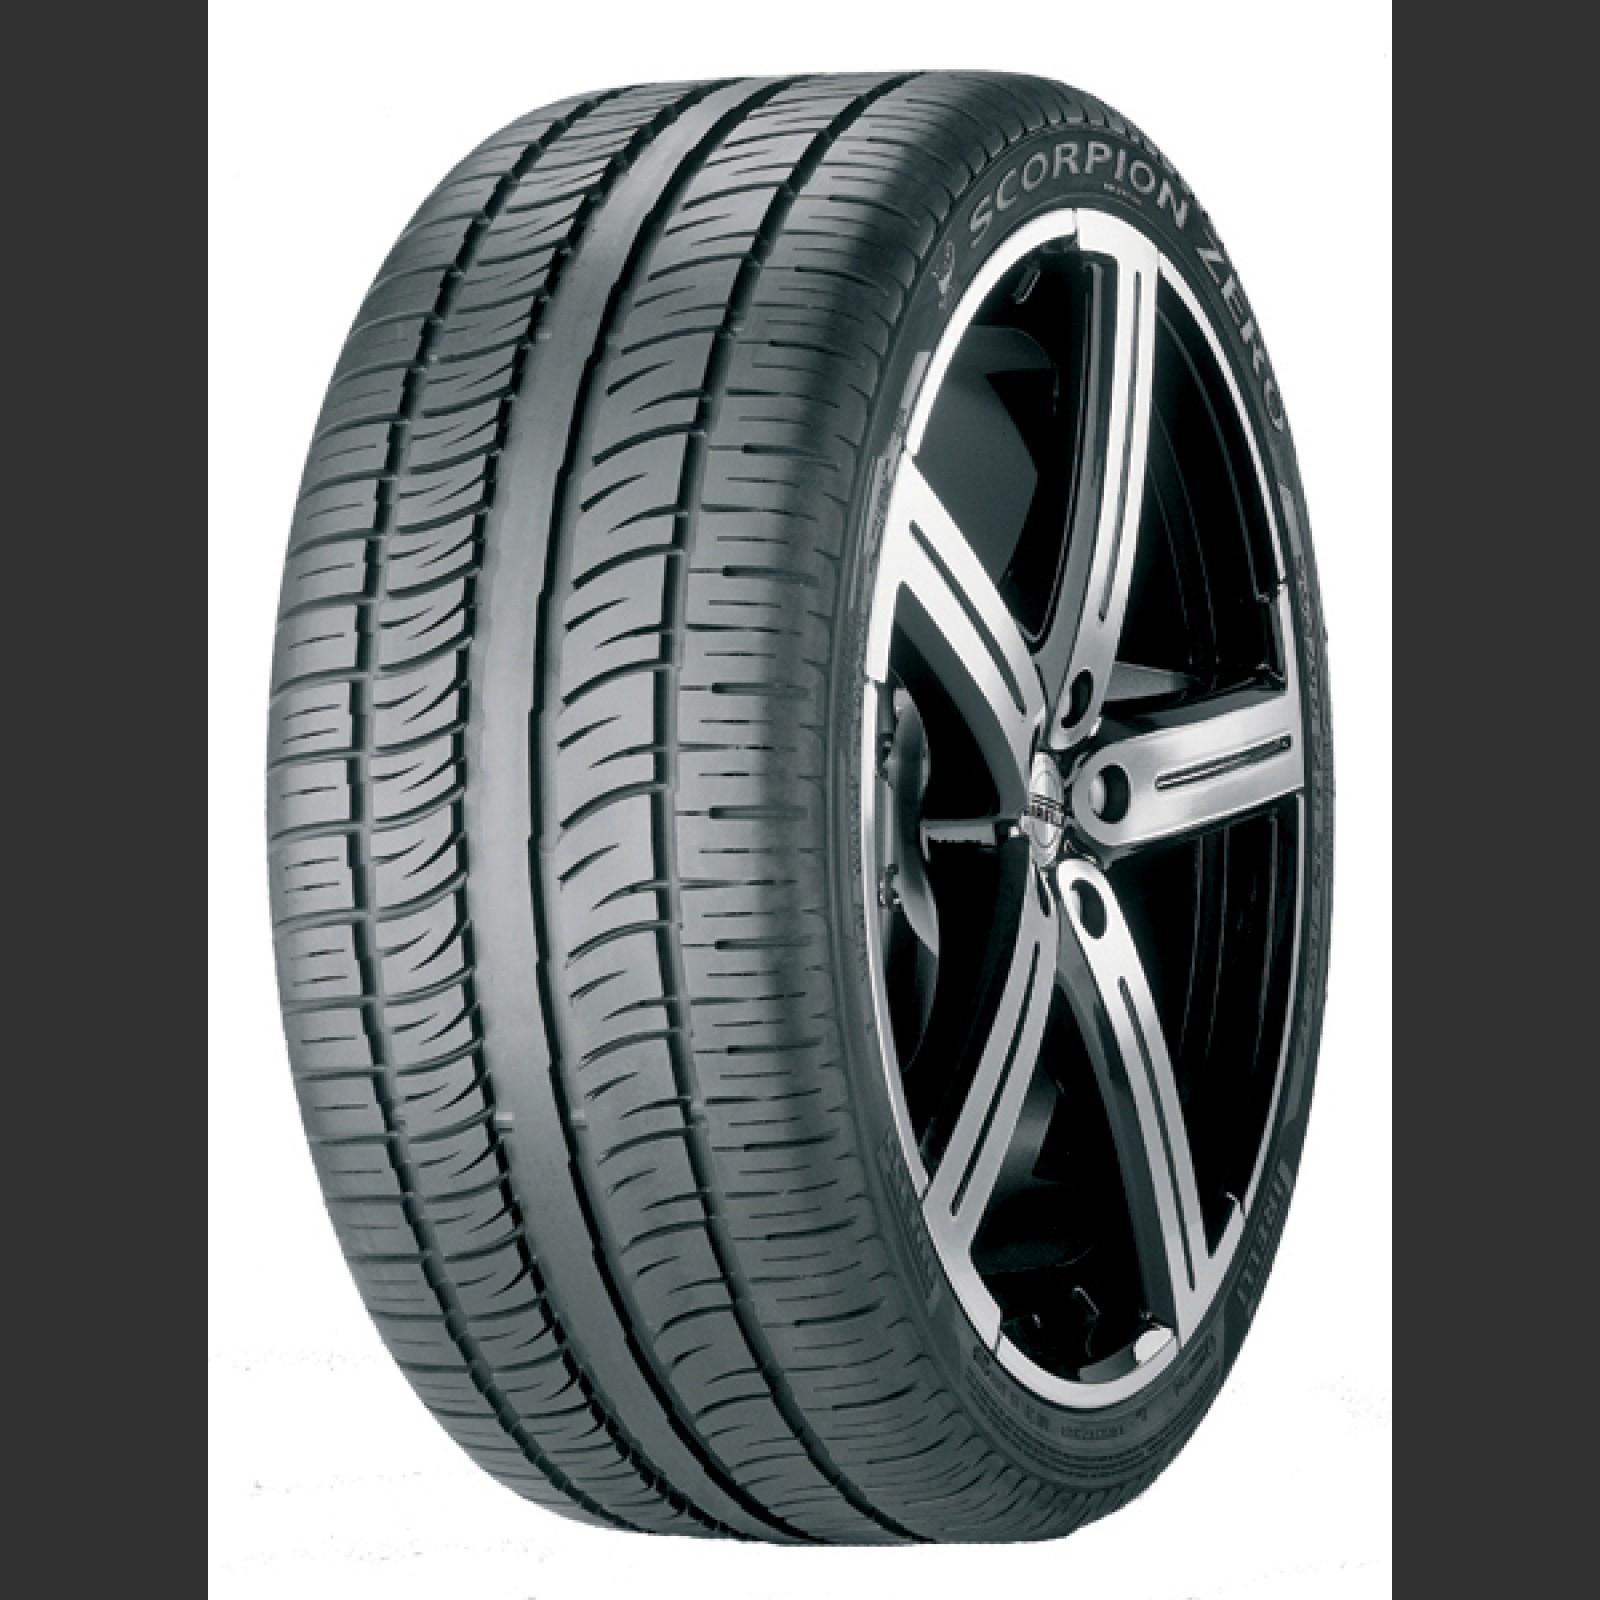 Pirelli Scorp. ZERO ASIM. (MO1) 275/50 R20 113W BB69 Osobní a SUV Letní